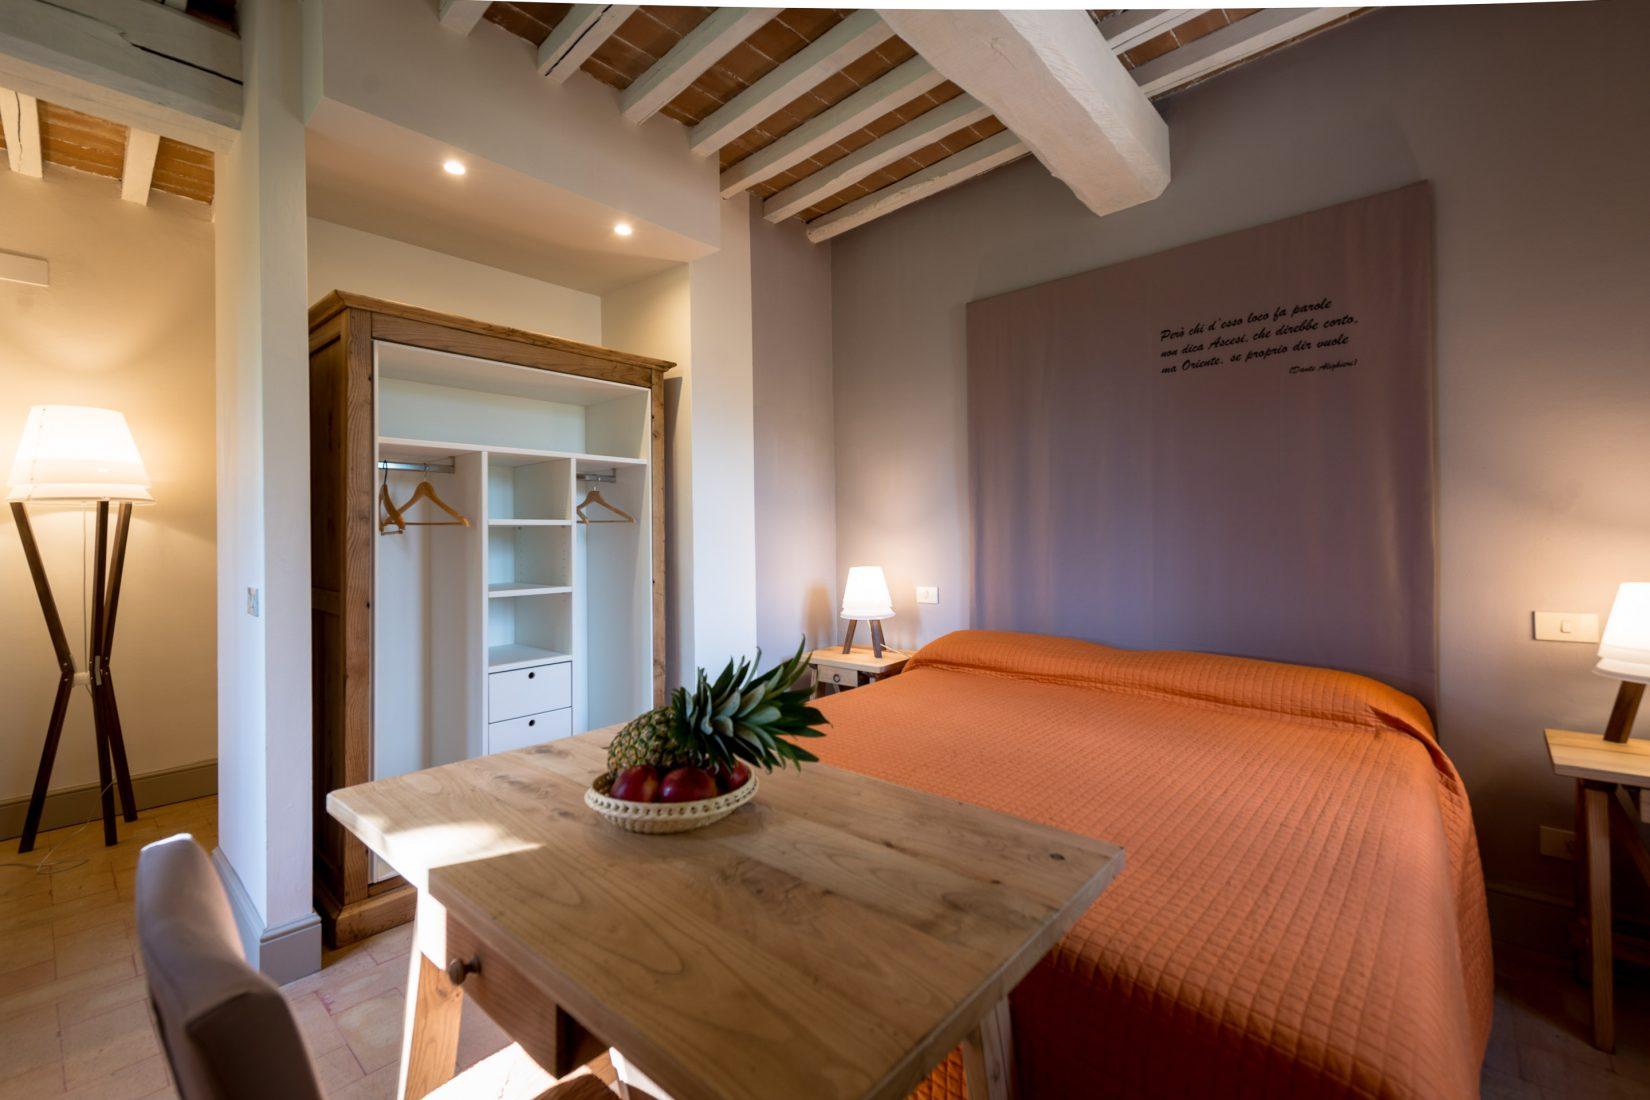 Alloro - Villamena Resort Assisi